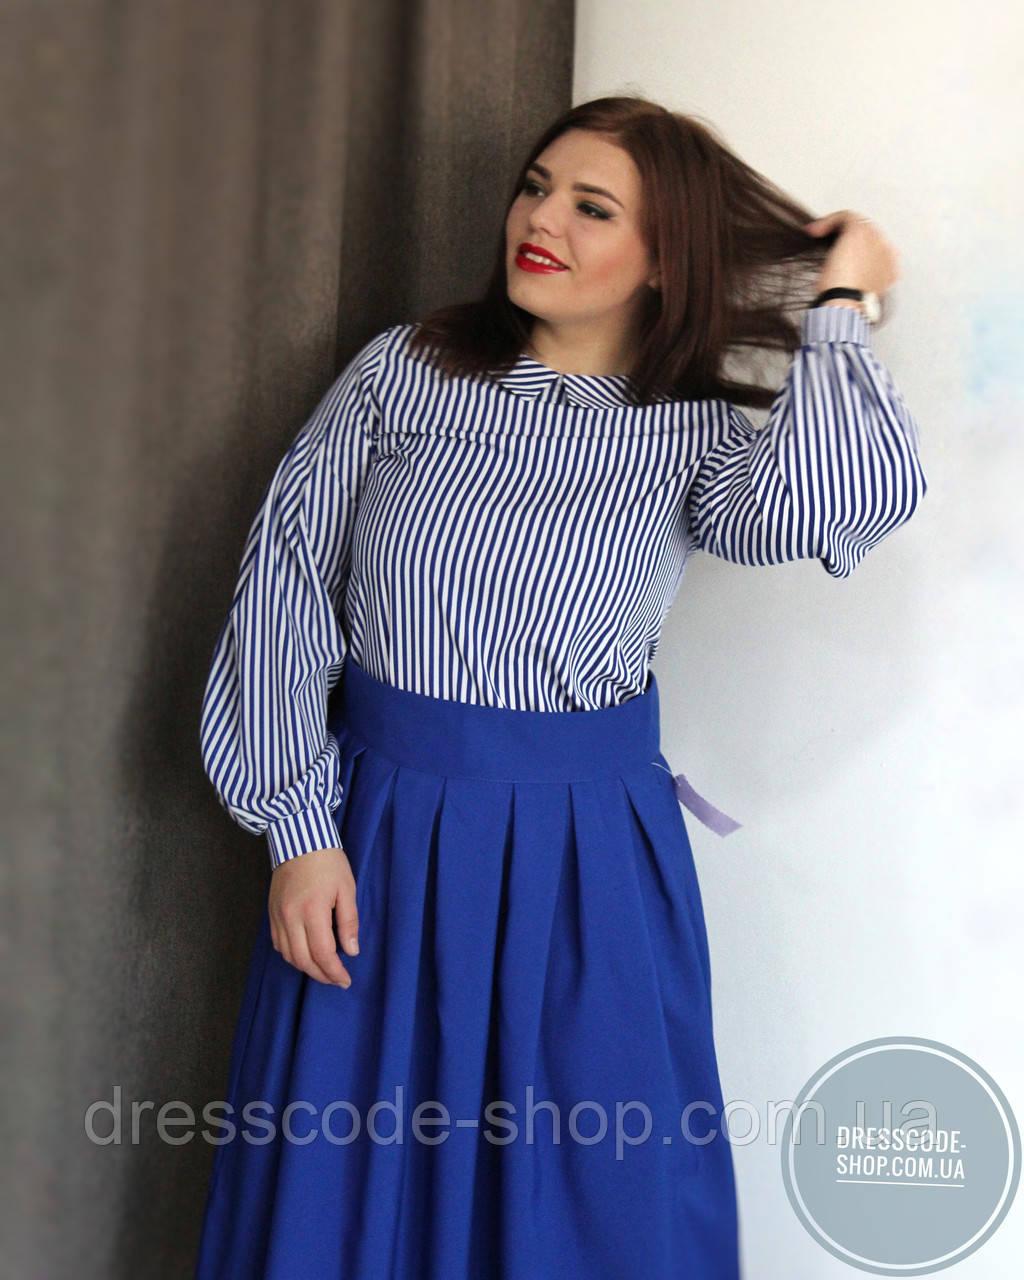 236c74aaa05 Юбка синяя миди в складку - Dresscode-shop в Житомирской области